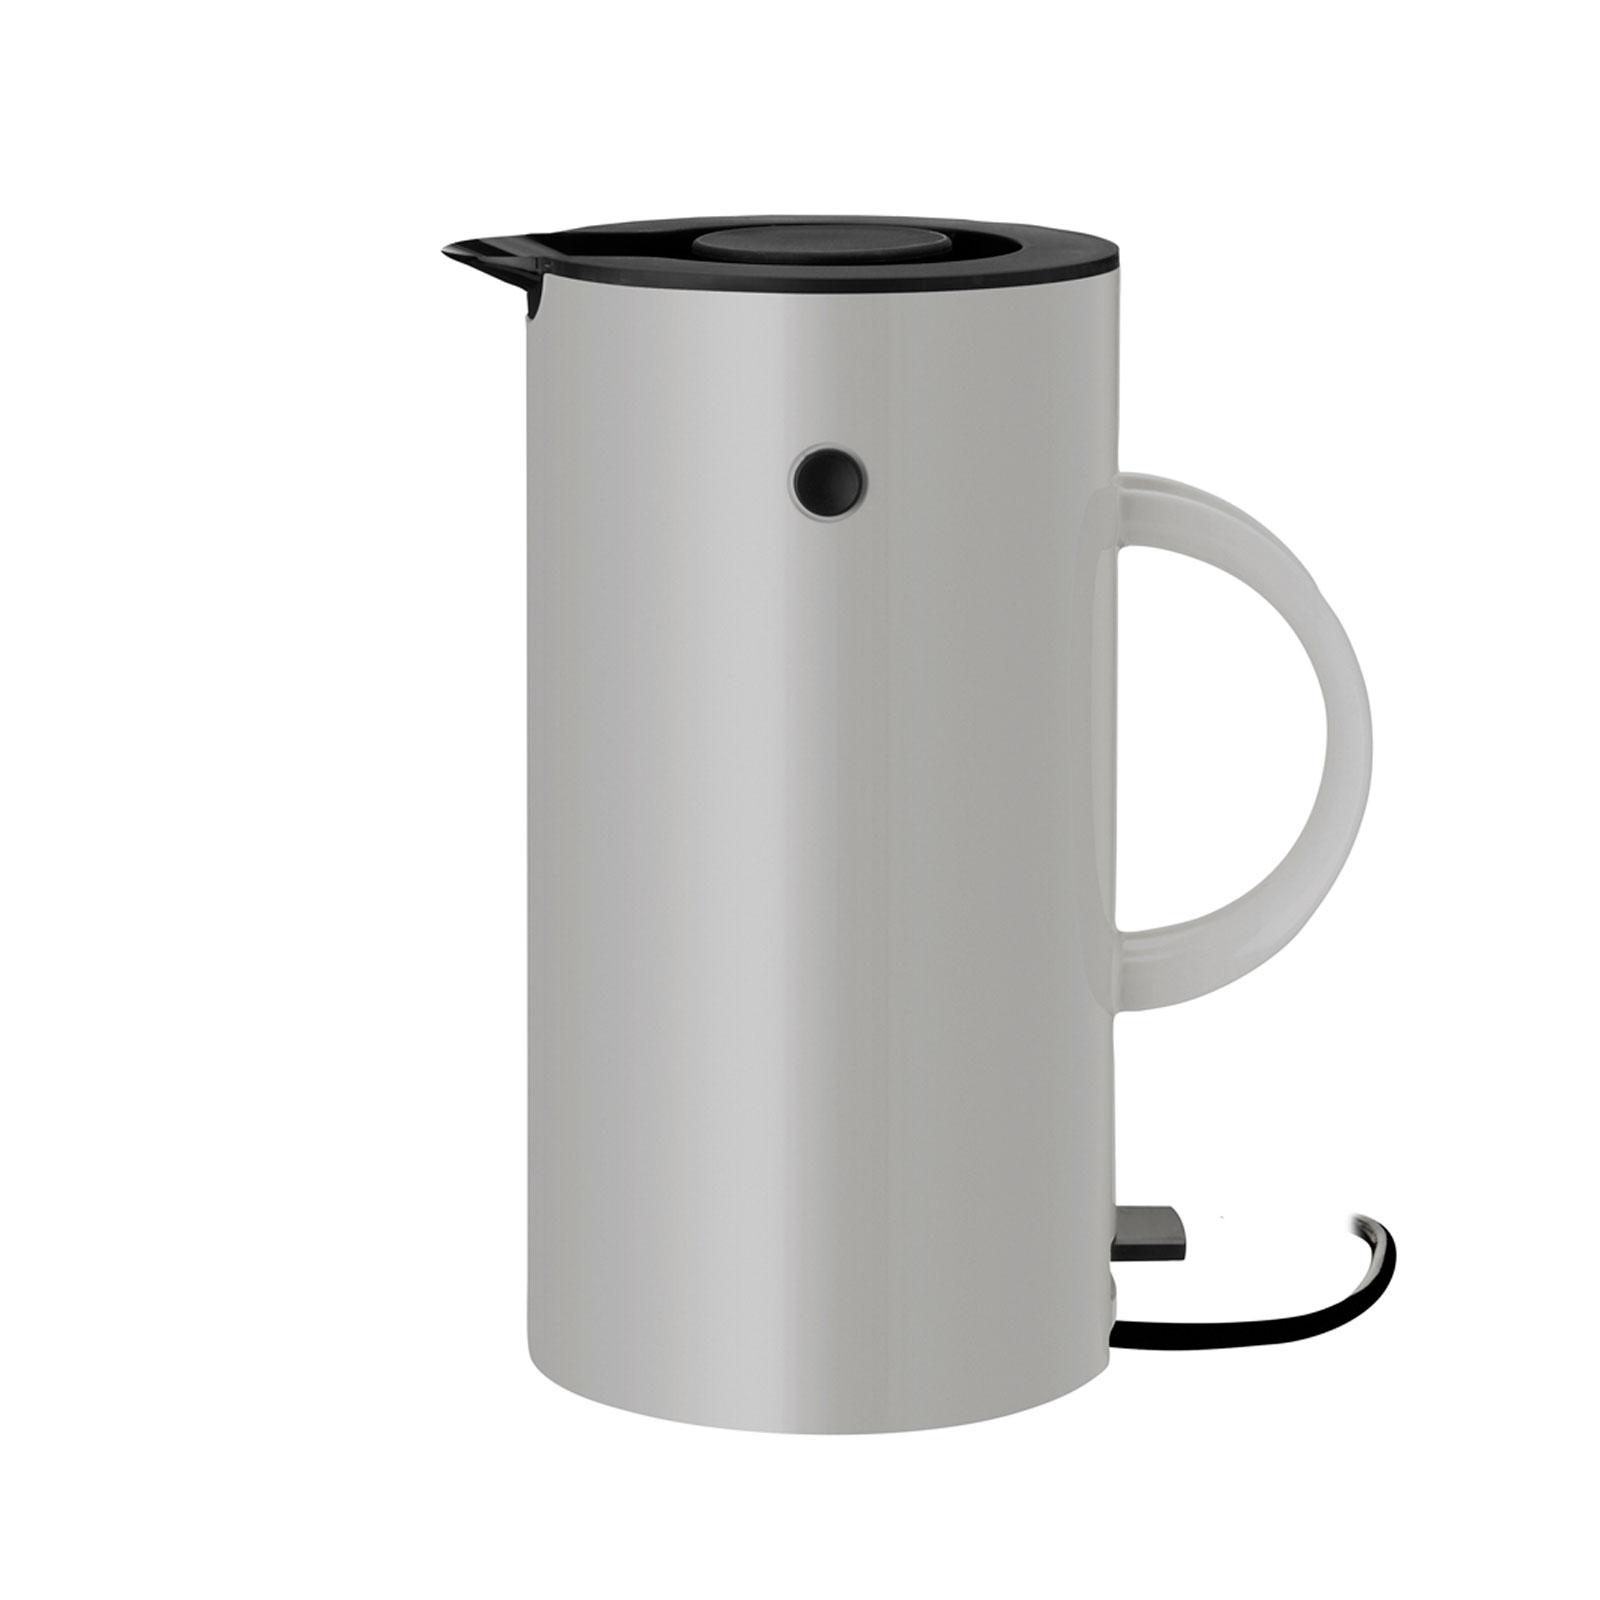 stelton EM77 Wasserkocher light grey Vol. 1,5 l